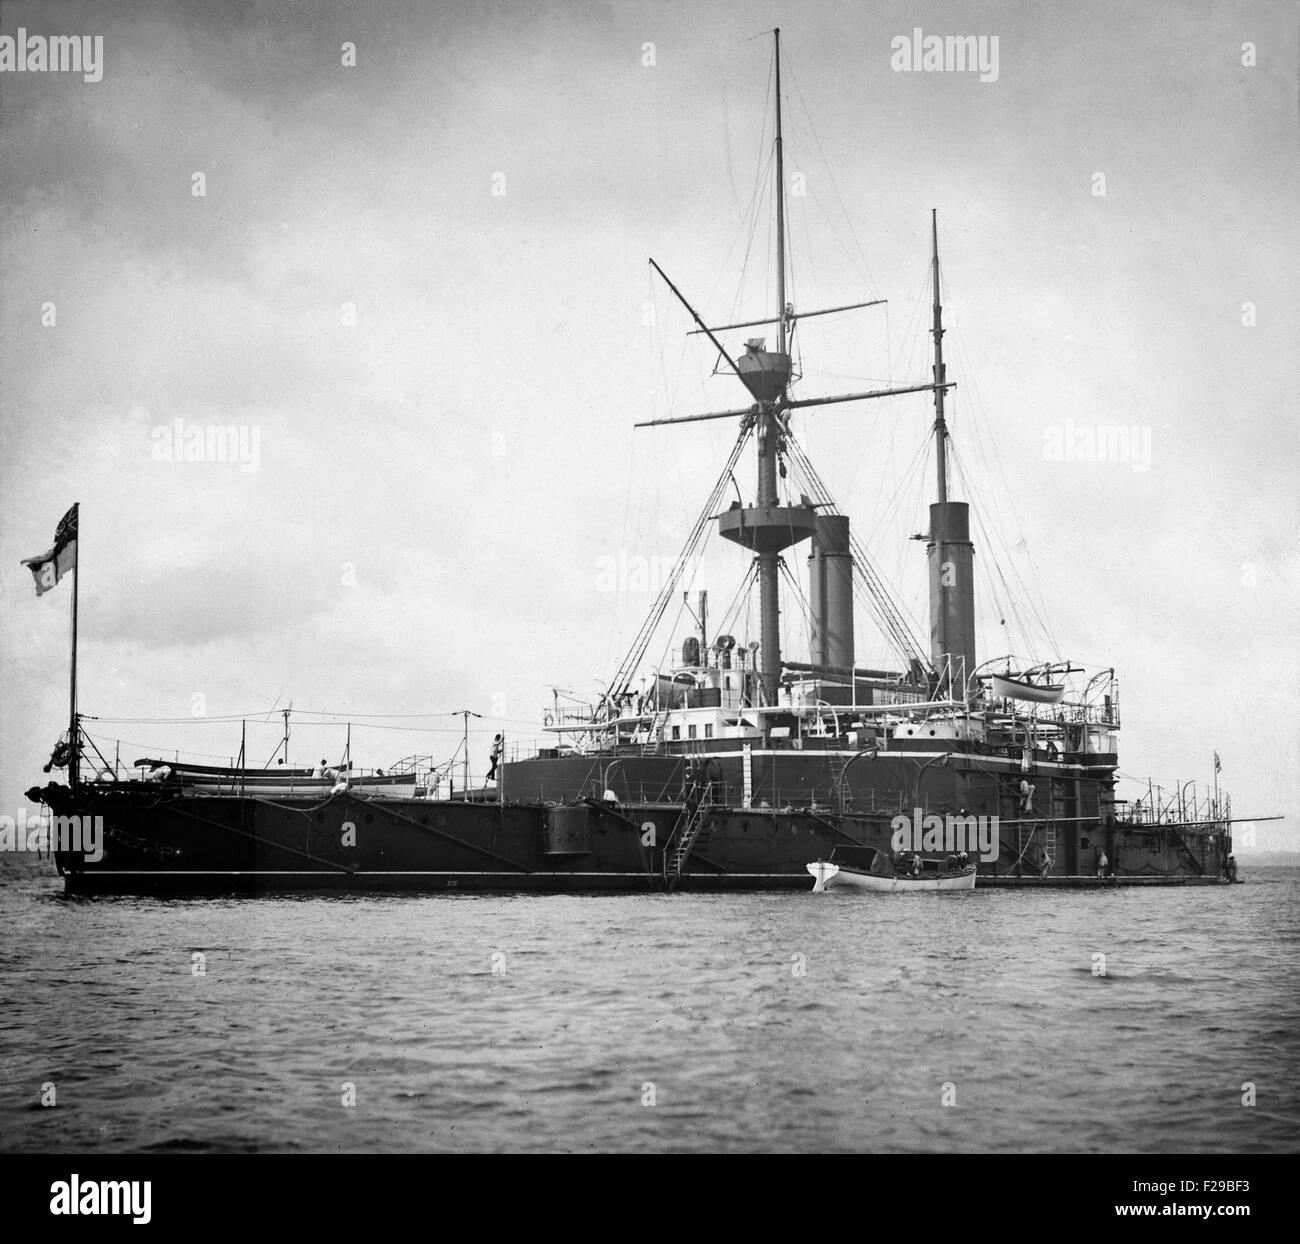 AJAXNETPHOTO.- 19TH CENTURY. 1888 - 1912 APPROX. SPITHEAD, ENGLAND. - VICTORIAN BATTLESHIP - HMS NILE, SISTER SHIP - Stock Image